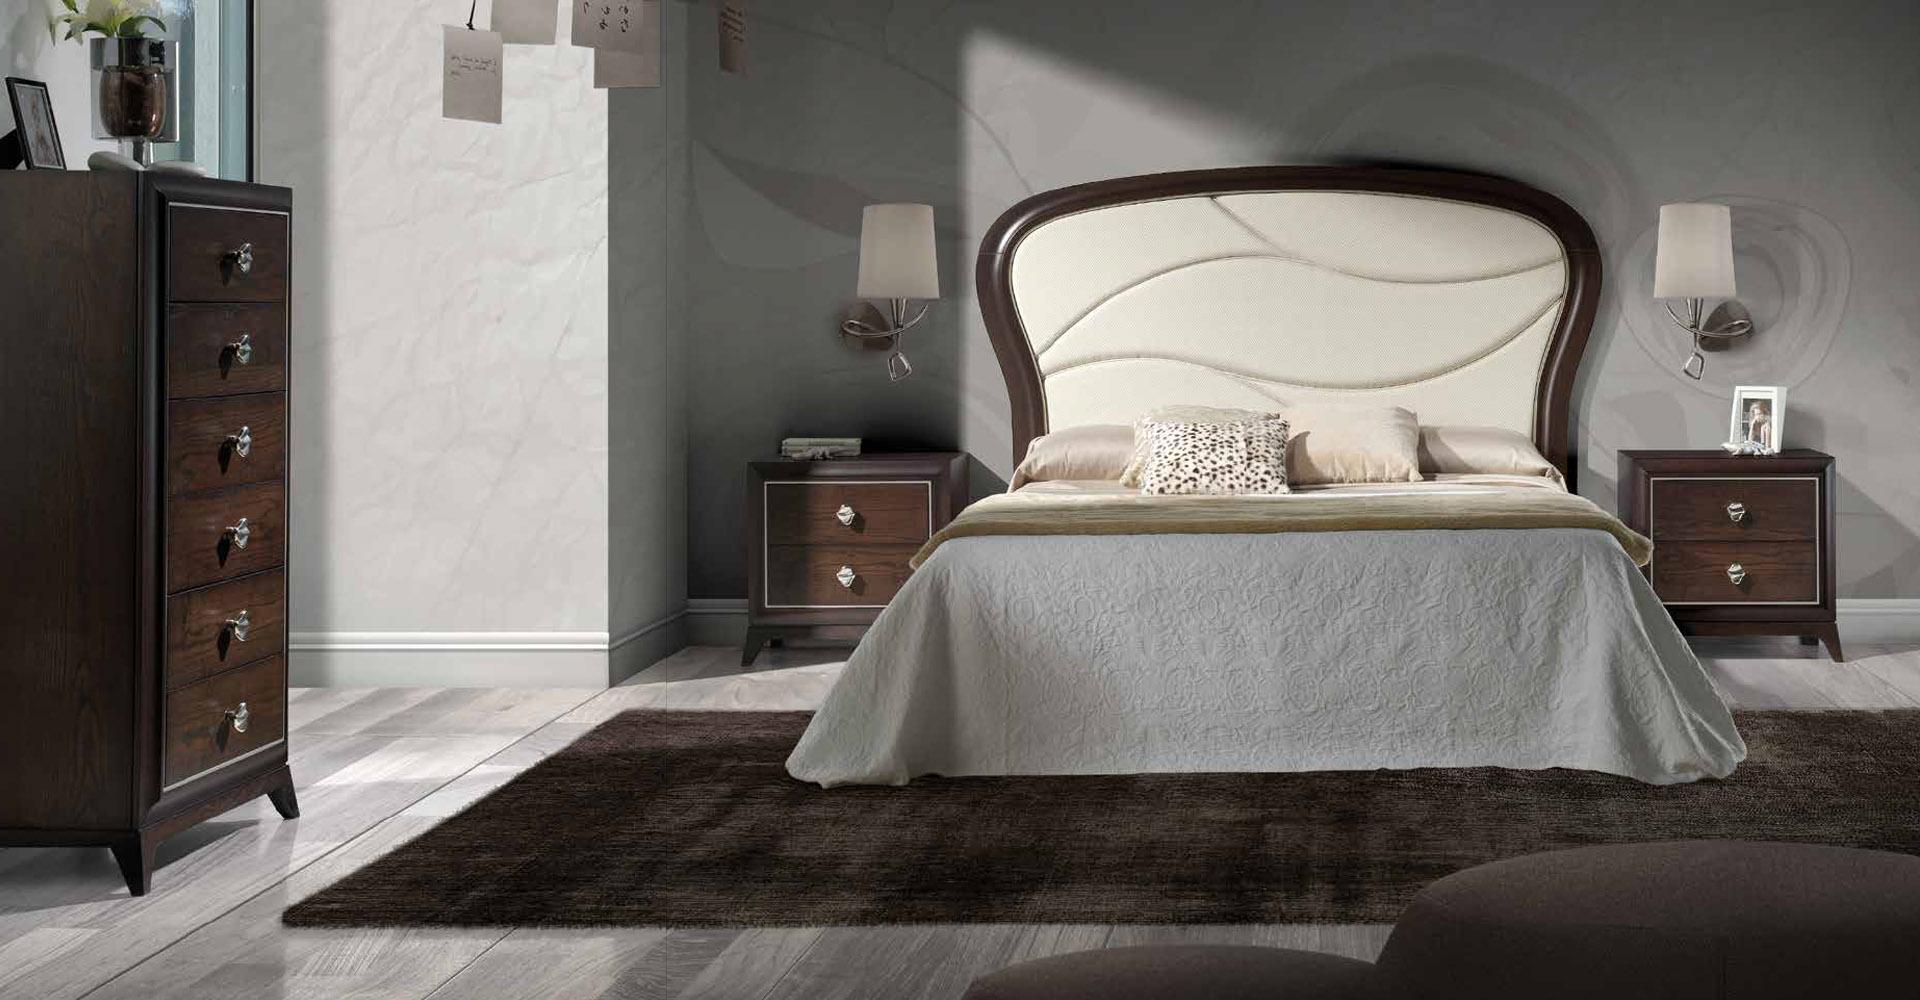 dormitorios de matrimonio de estilo clasico (22)